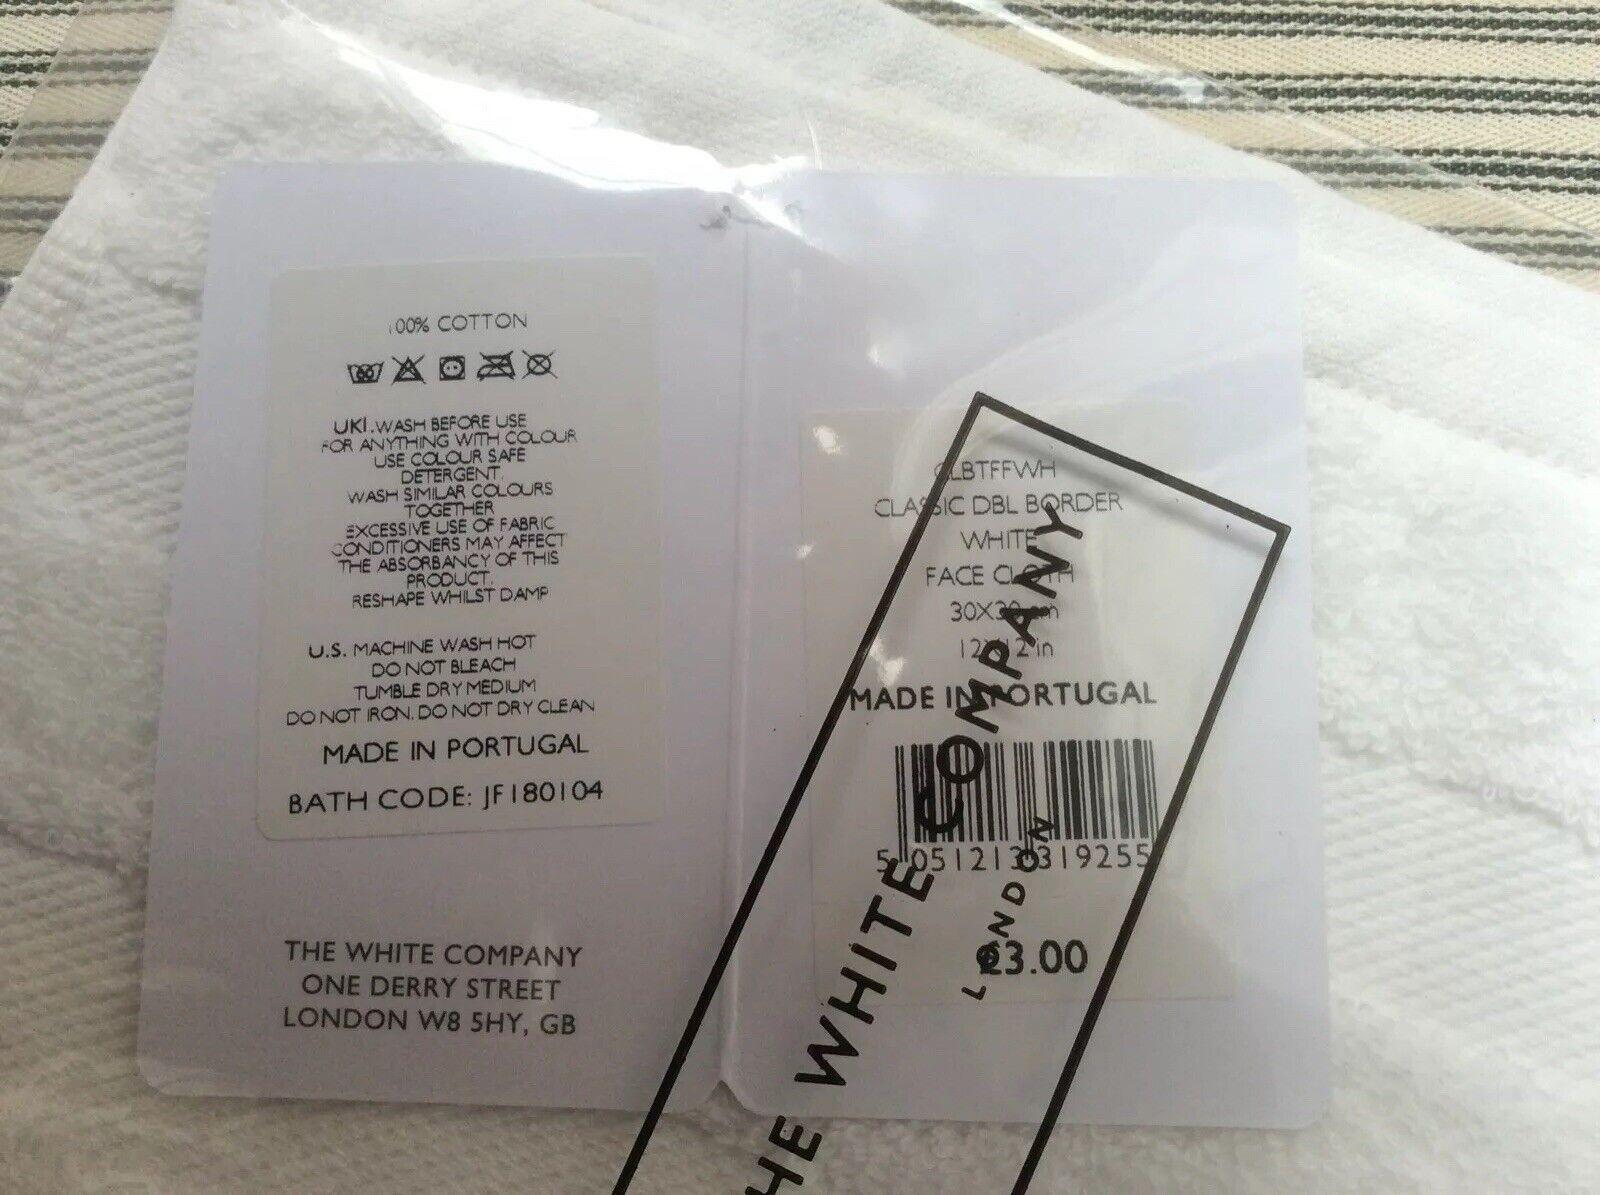 The White Company White Face Cloth BNWT